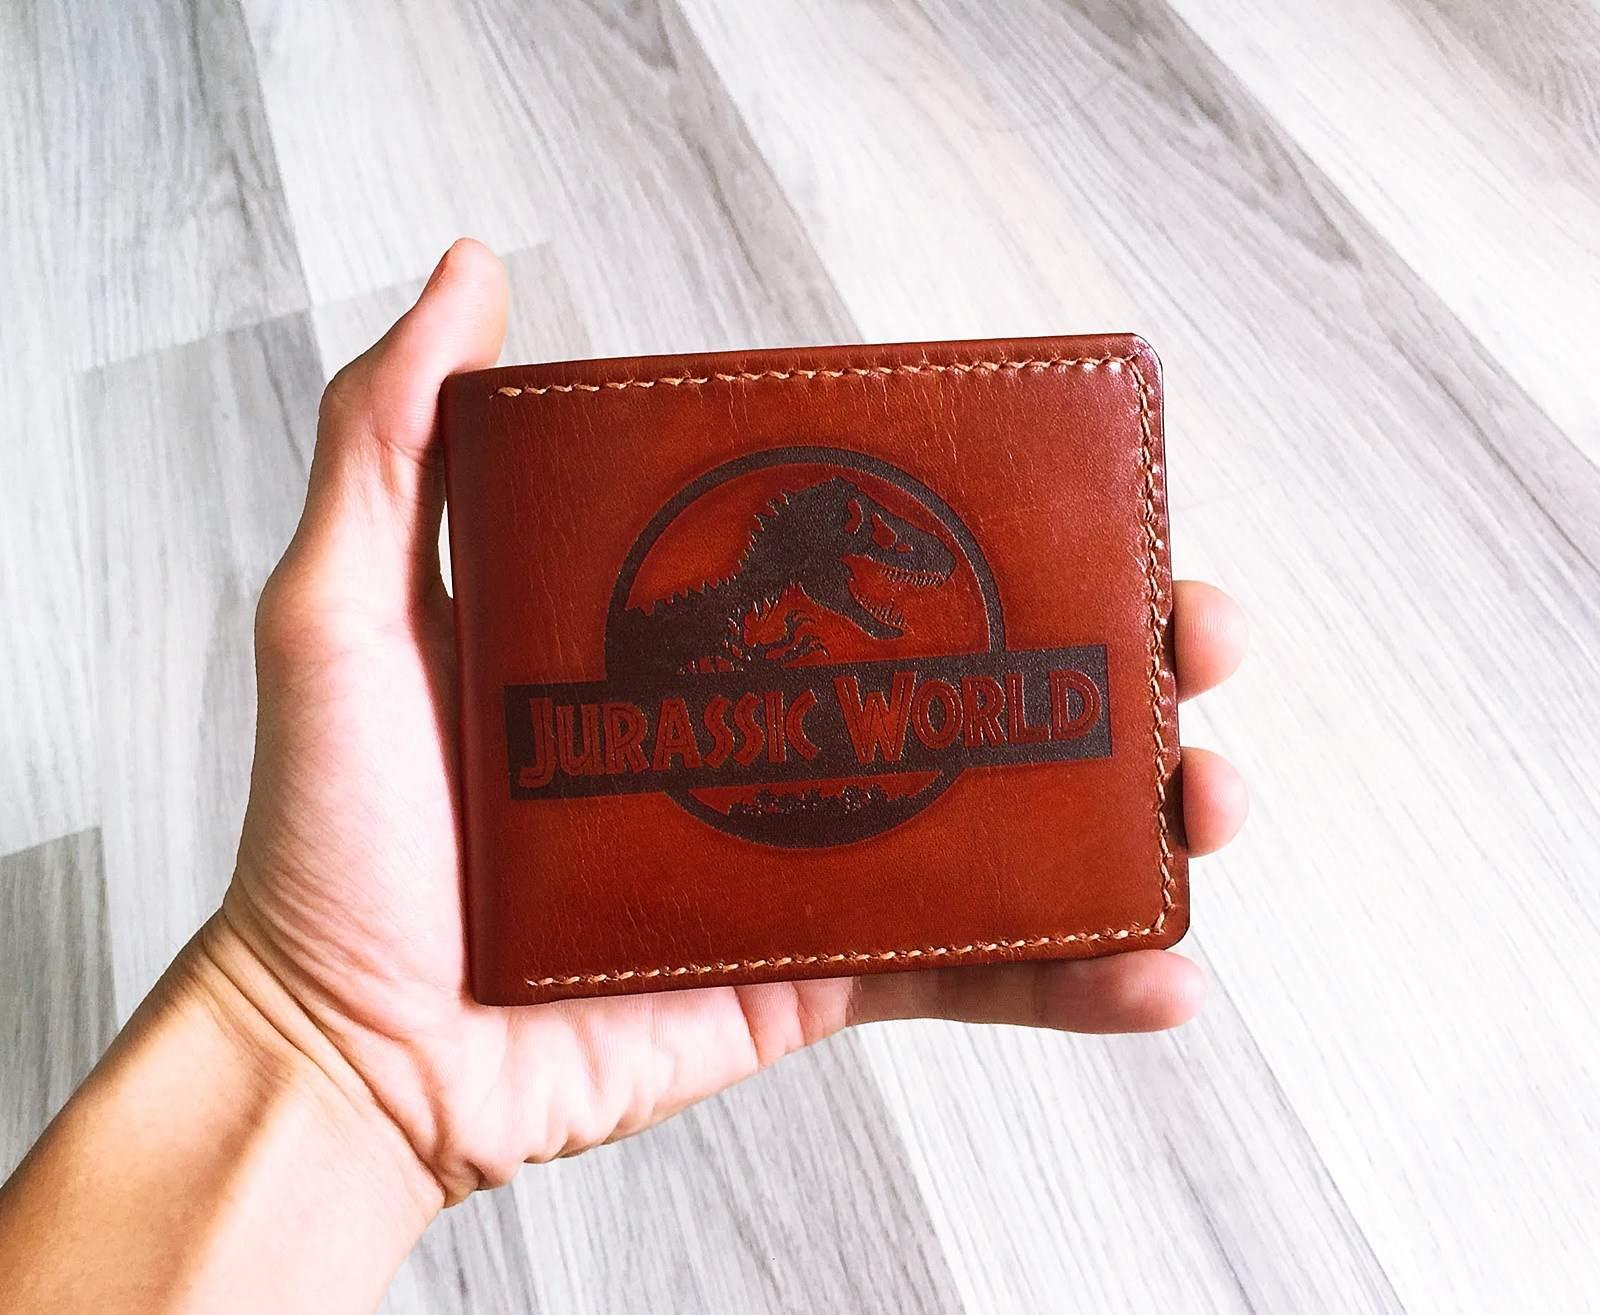 Unik4art - Jurassic World leather handmade men slim wallet anniversary gifts - 4LE